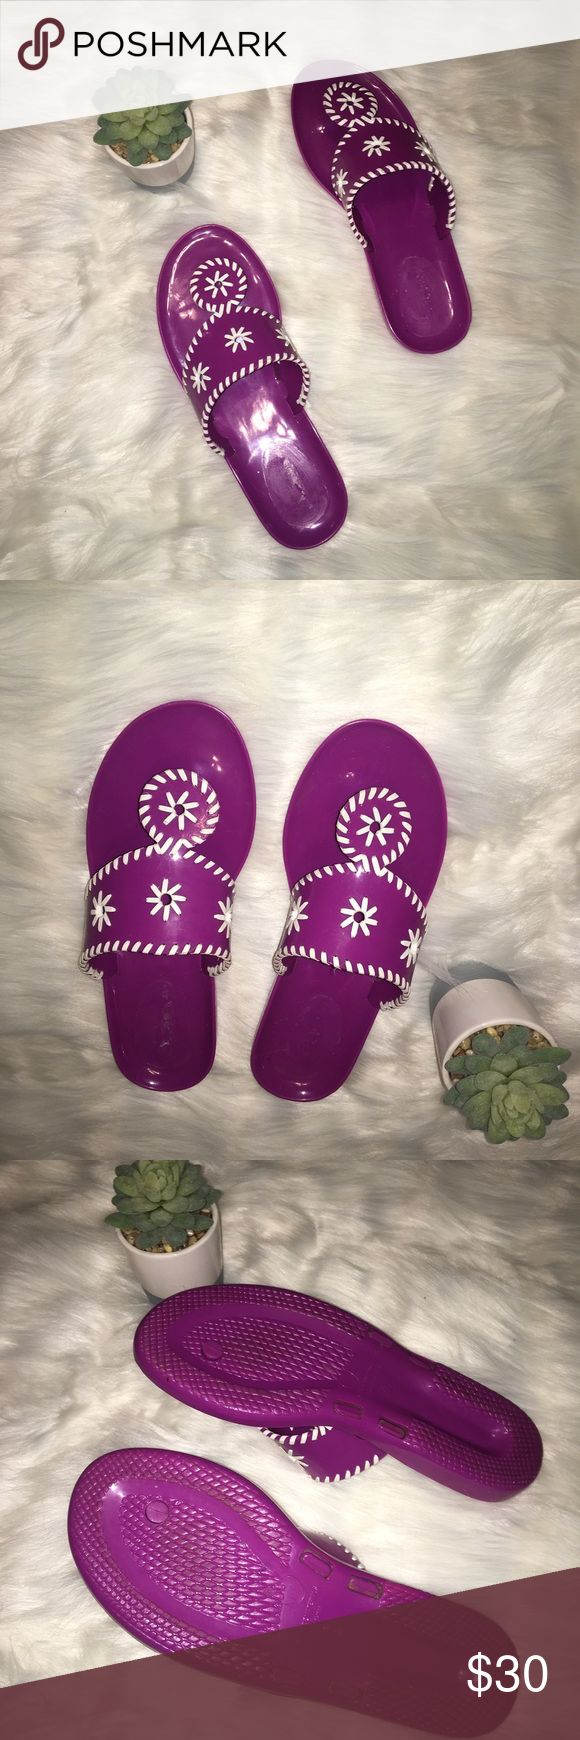 Women's Purple Steve Madden Floral Jelly Sandals Style similar to Jack Rogers Jelly Sandals. No longer sold. Super cute Statement sandal 💯 Steve Madden Shoes Sandals